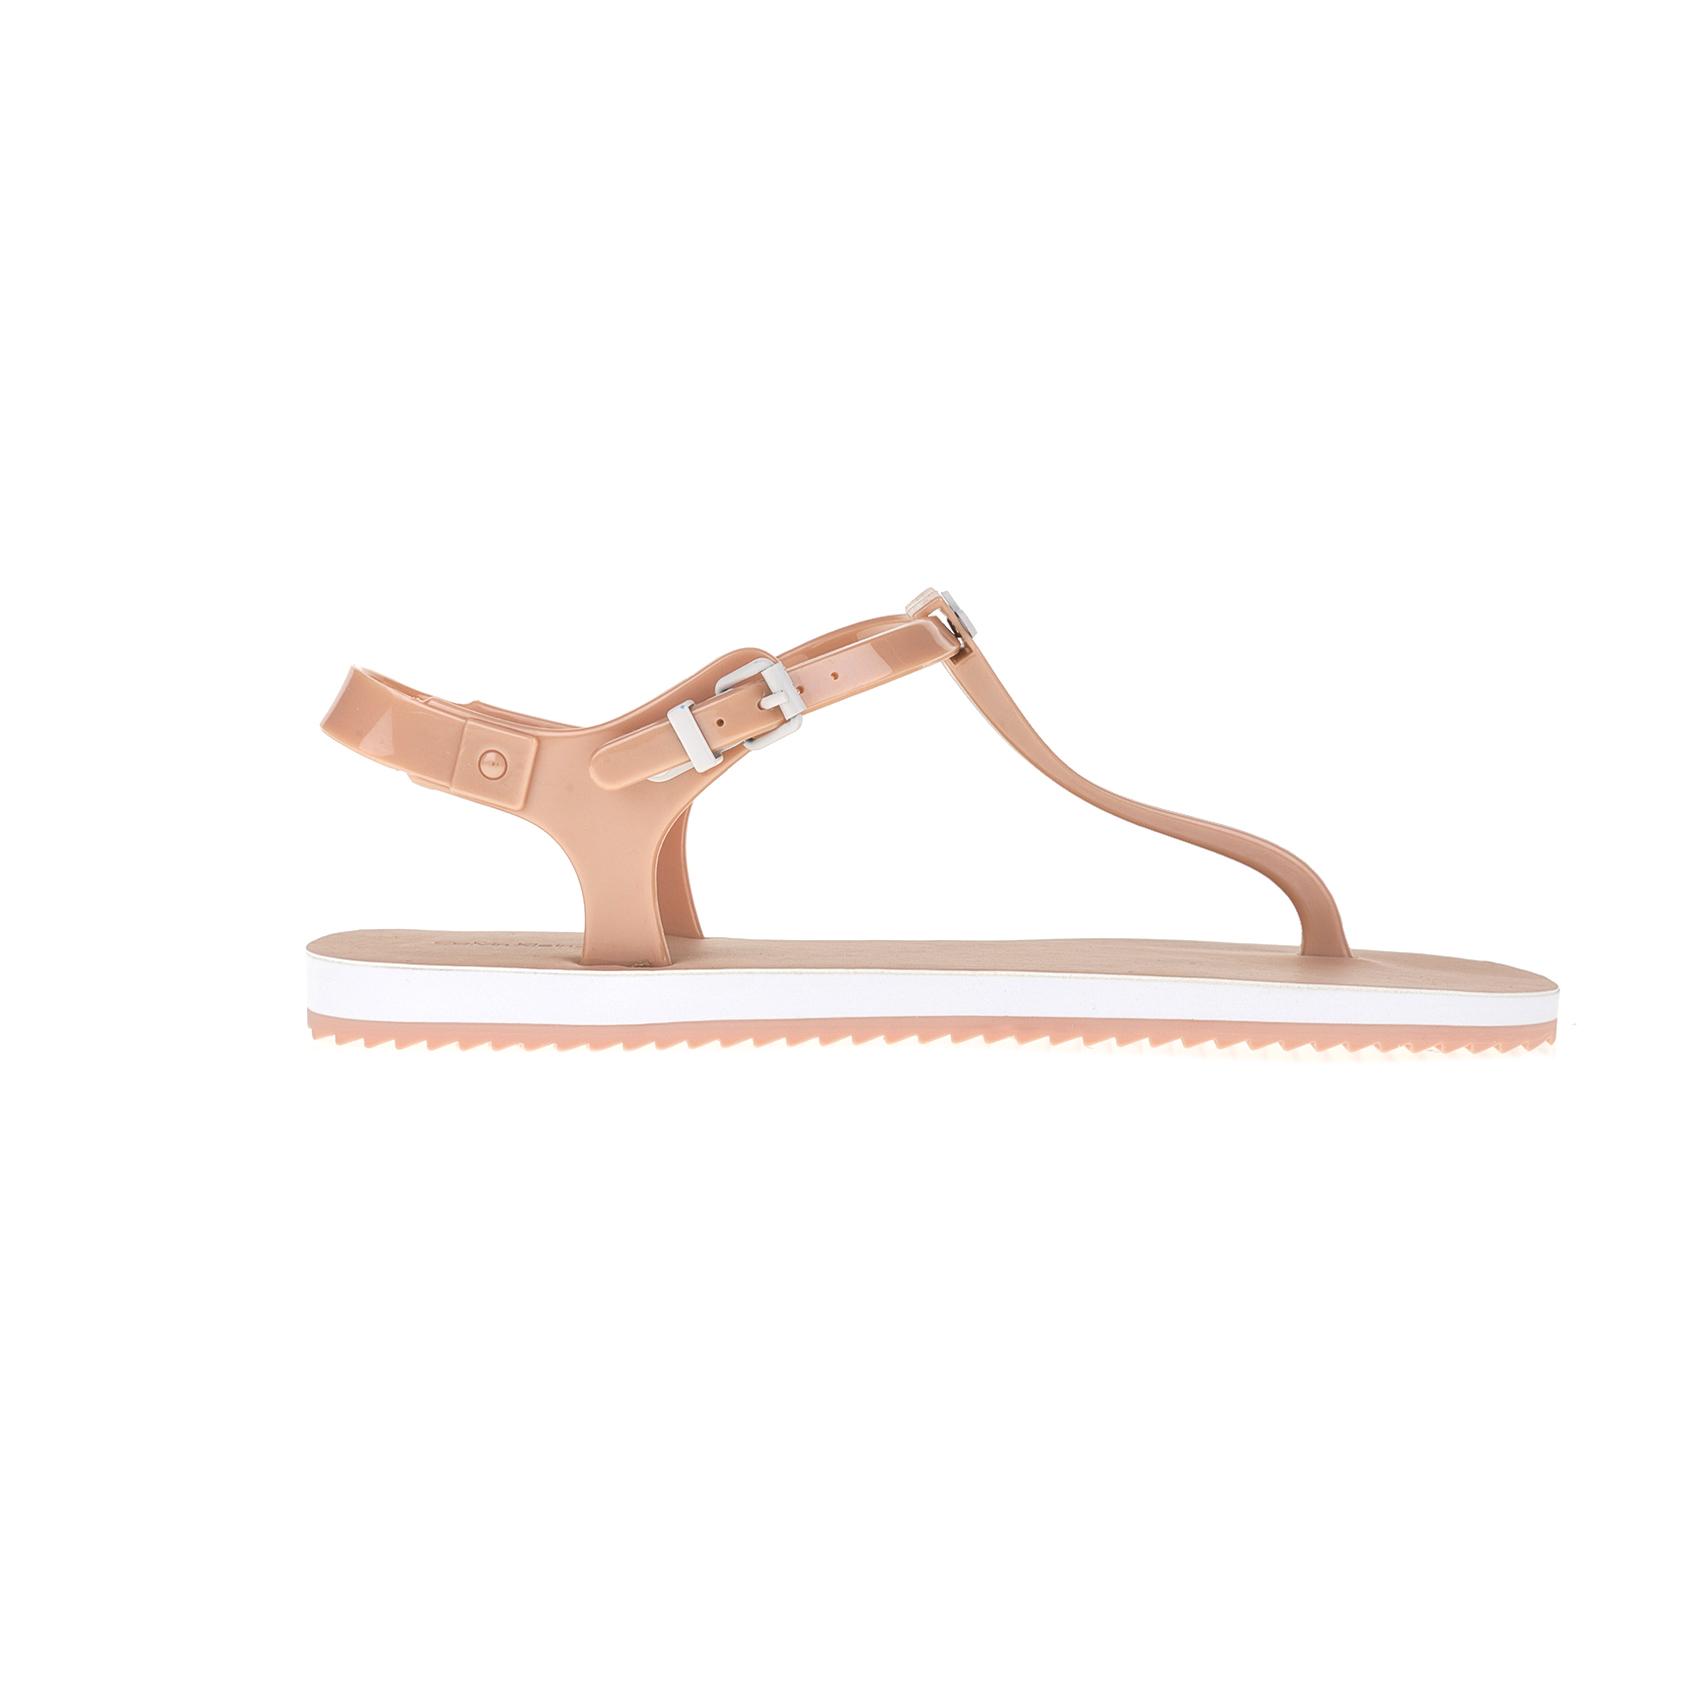 CALVIN KLEIN JEANS – Γυναικεία σανδάλια CALVIN KLEIN JEANS ροζ